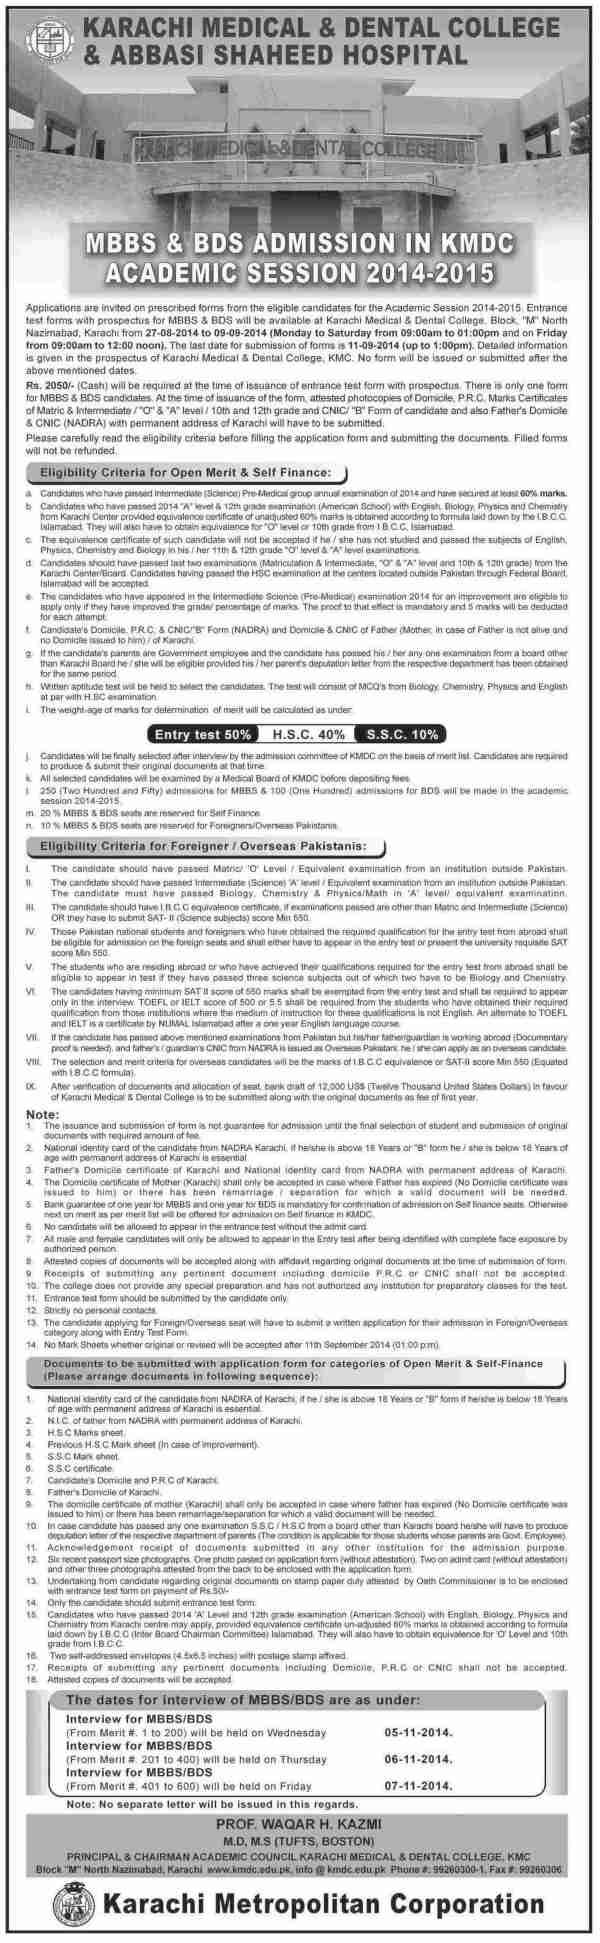 Karachi Medical and Dental College BDS,MBBS Admissions 2014